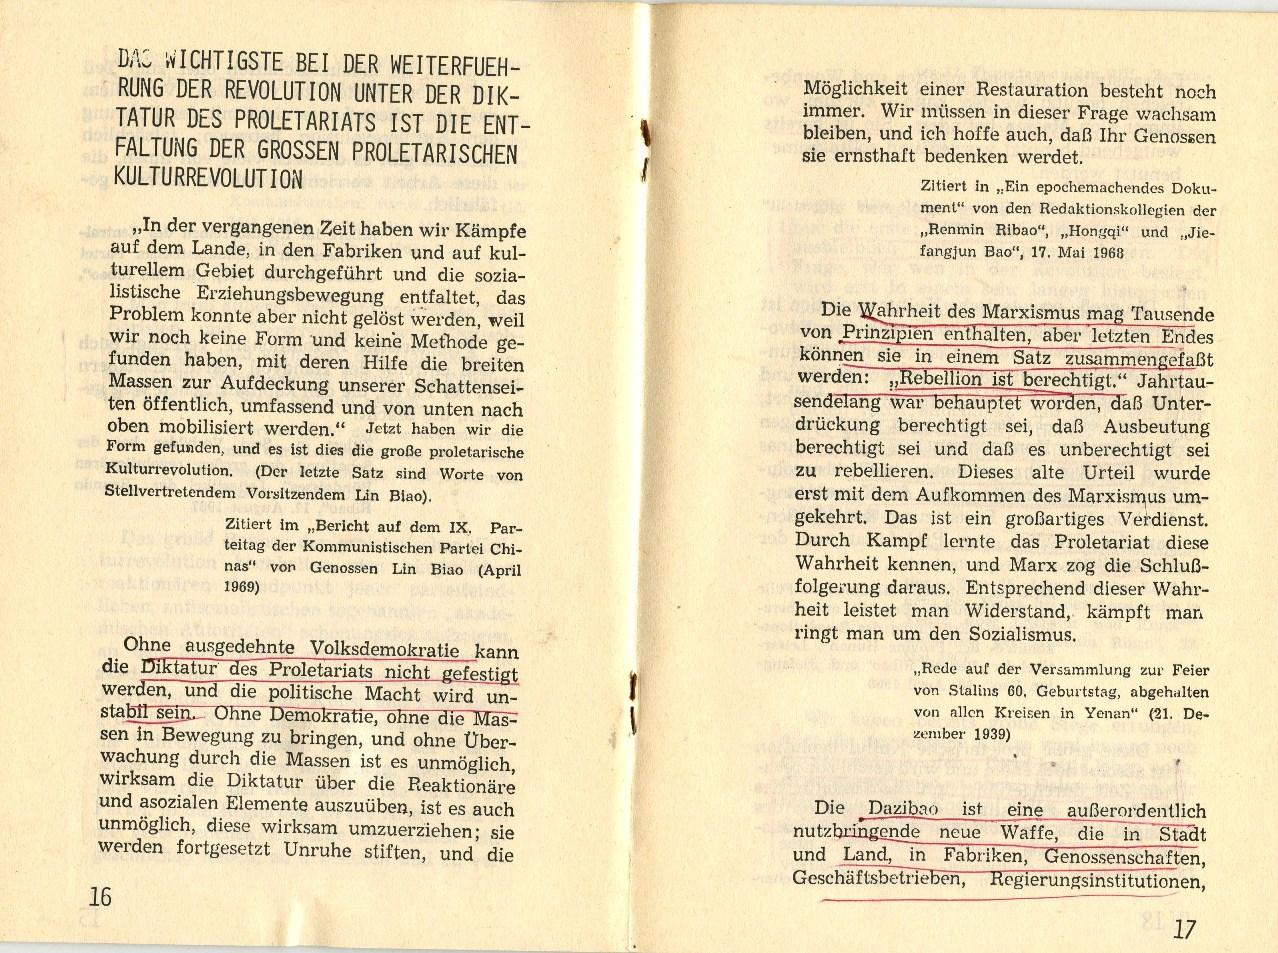 ZB_Mao_Revolutionstheorie_1971_10